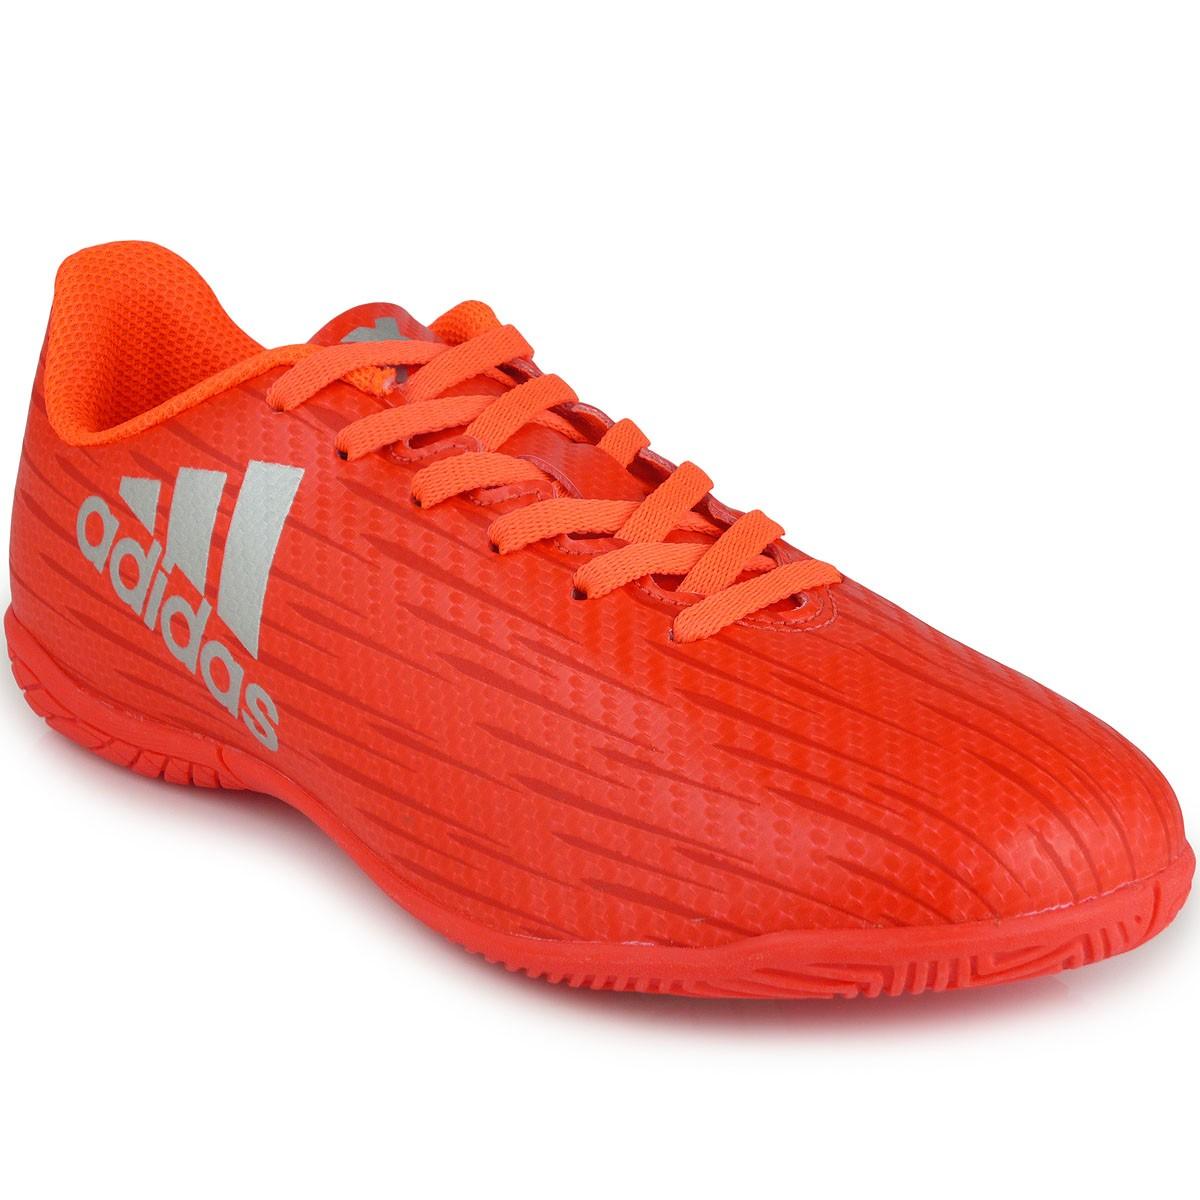 509577f1db Chuteira Adidas X 16.4 IN Jr